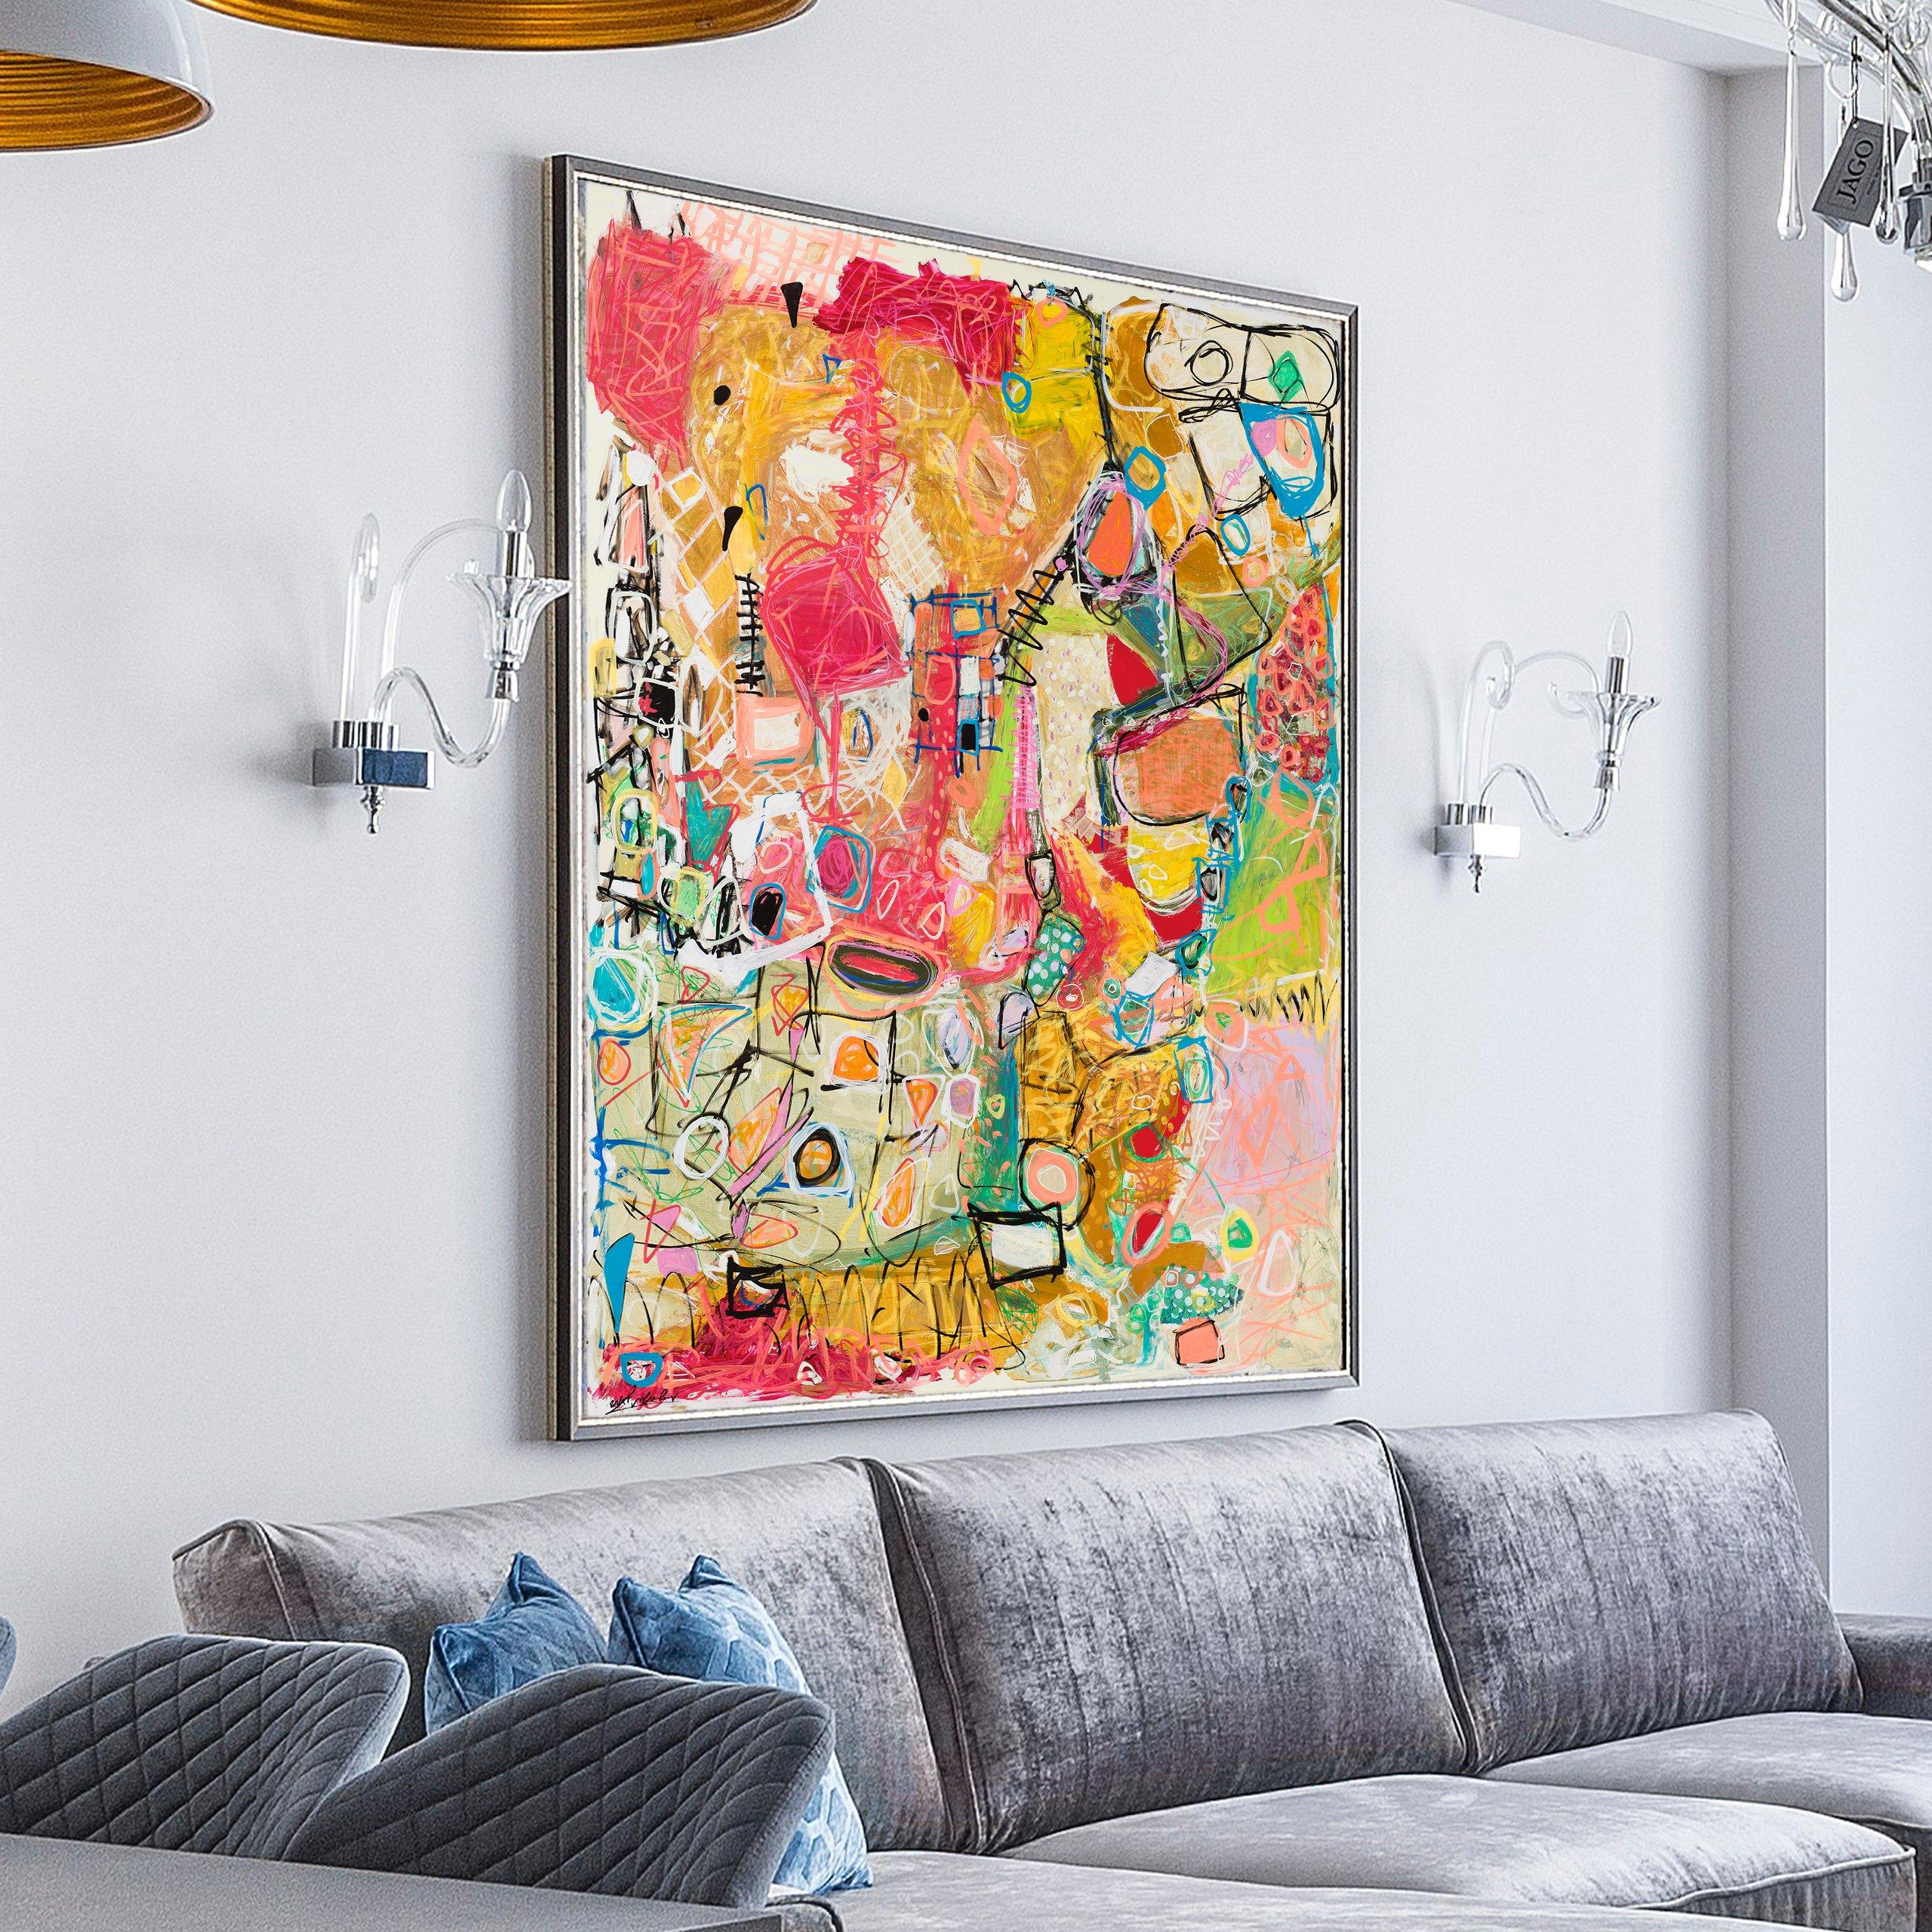 michal-rotman-art-on-canvas-painting